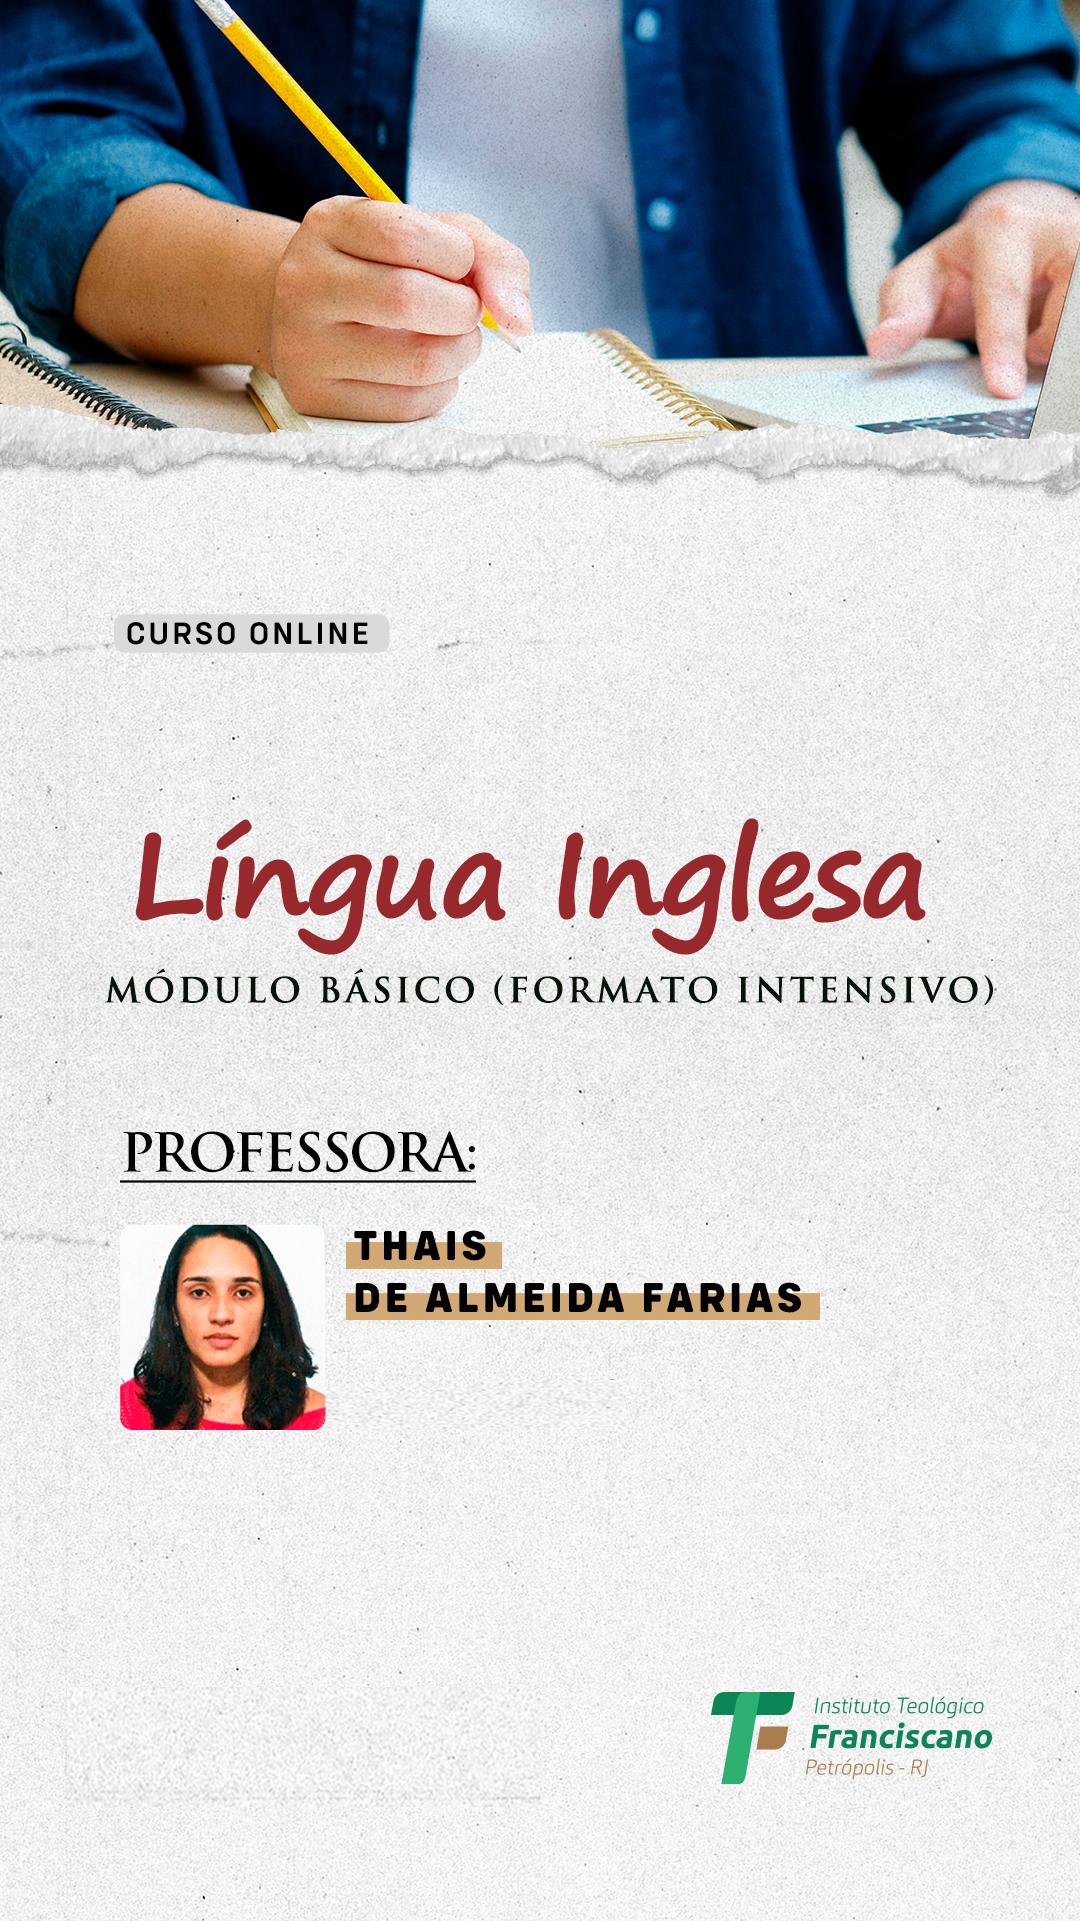 Língua Inglesa – Módulo básico (formato intensivo)